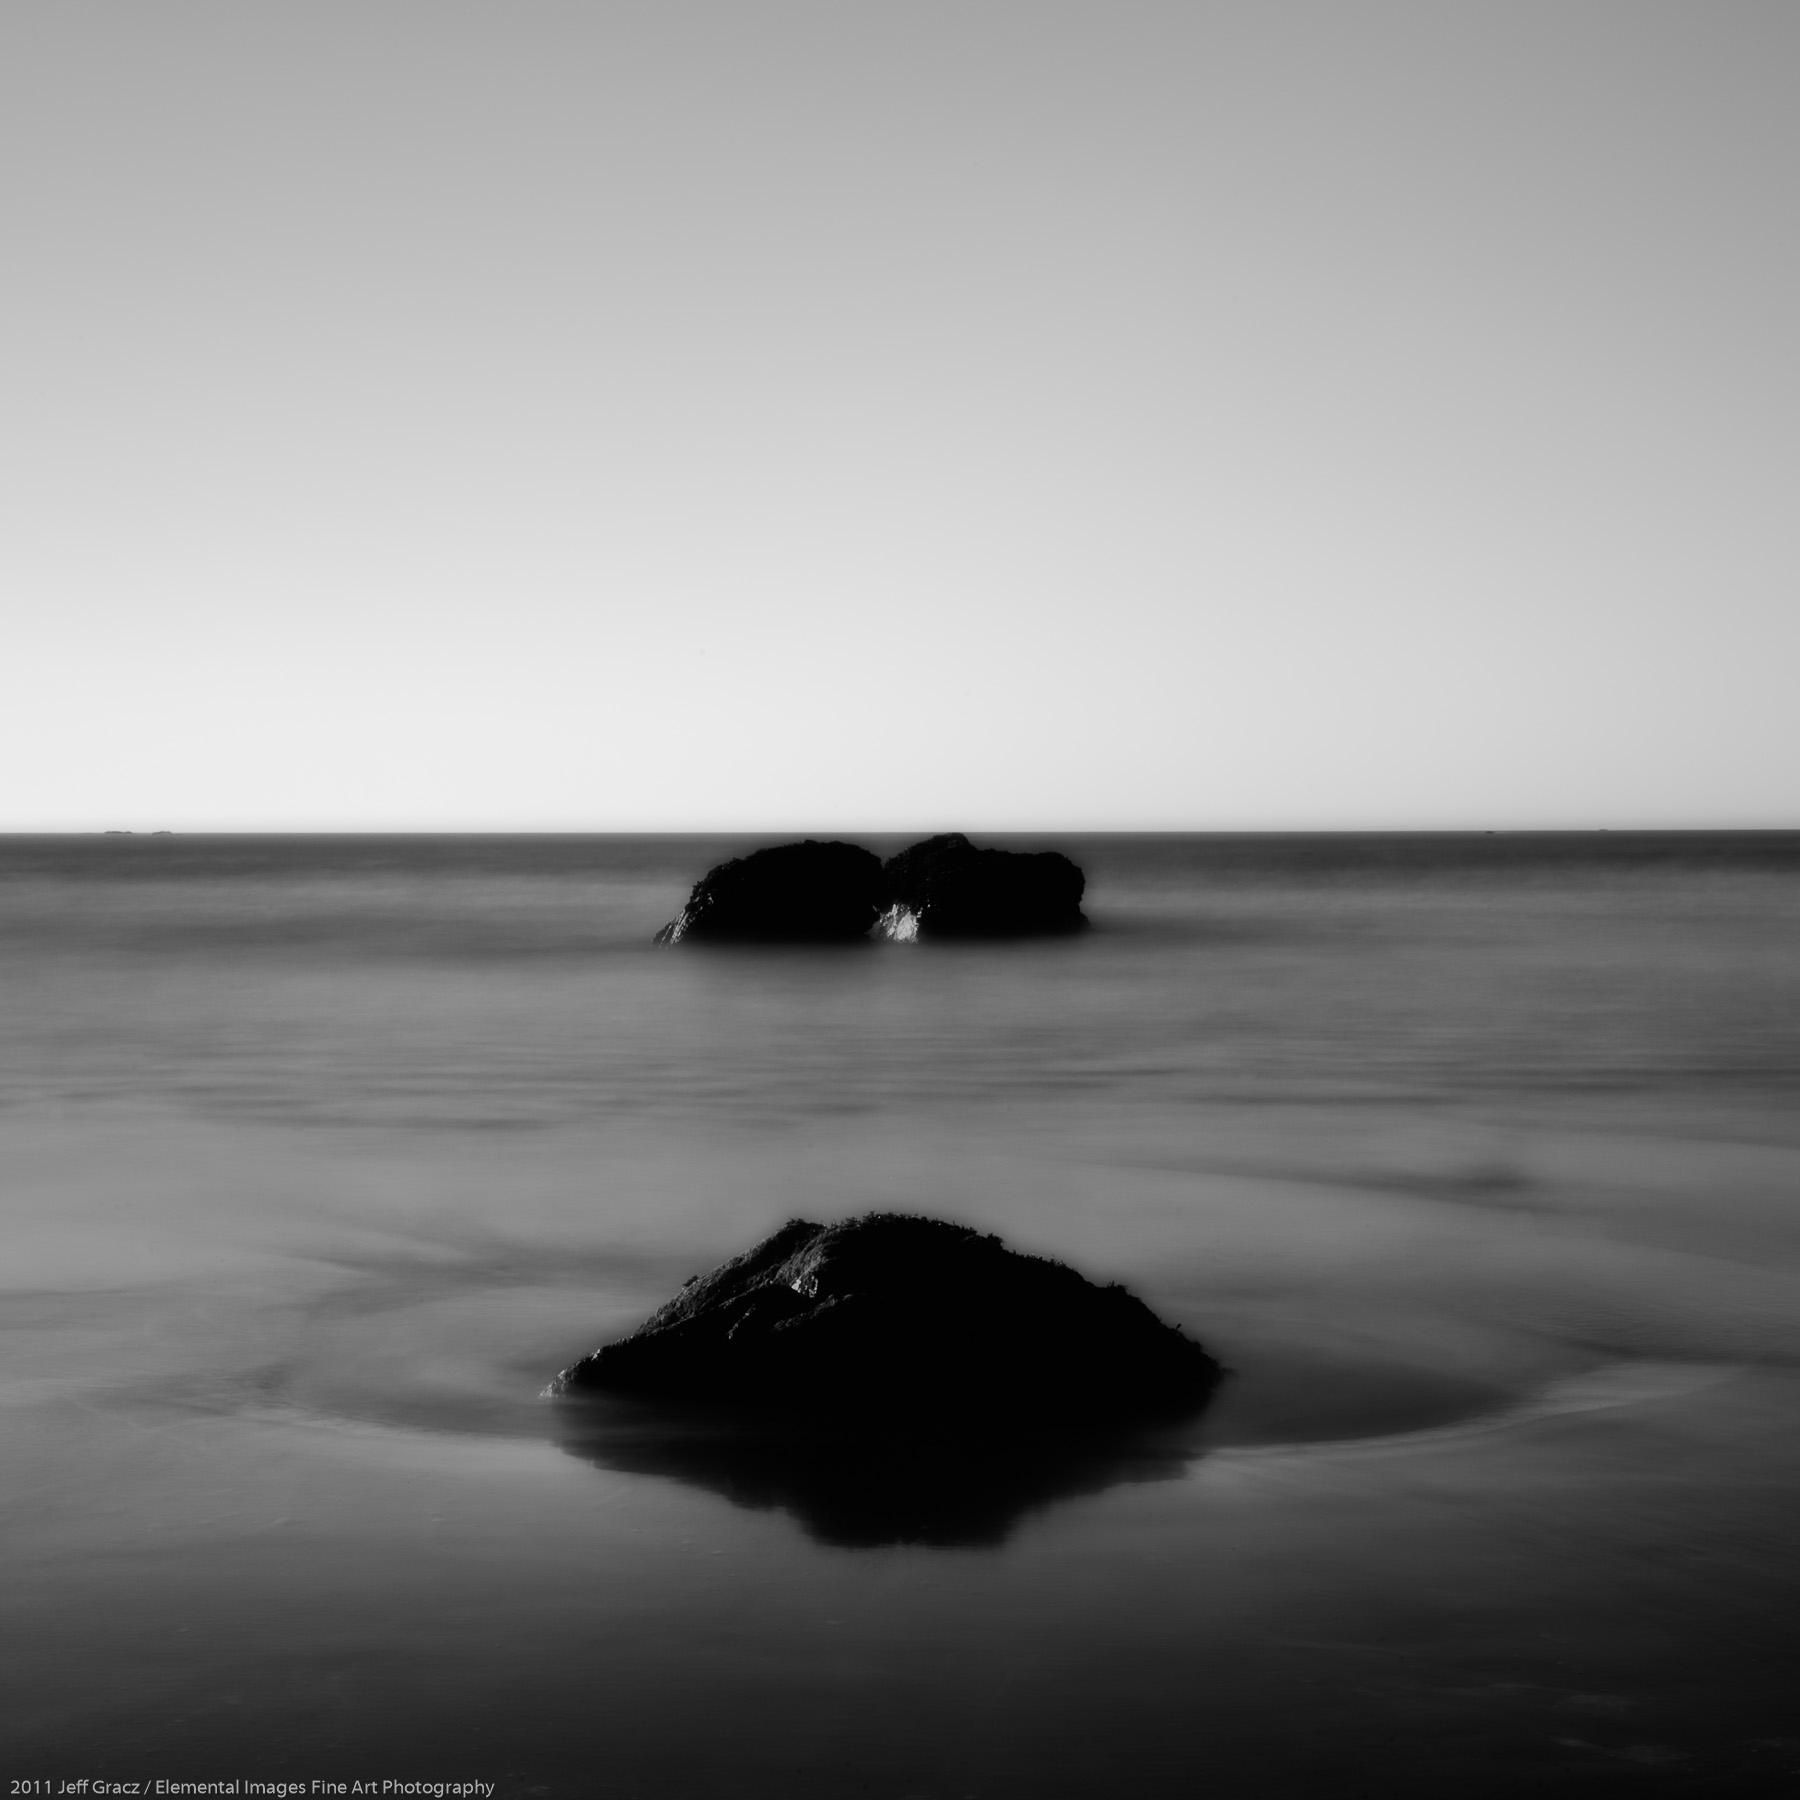 Zen Rocks IV | Trinidad | CA | USA - © 2011 Jeff Gracz / Elemental Images Fine Art Photography - All Rights Reserved Worldwide